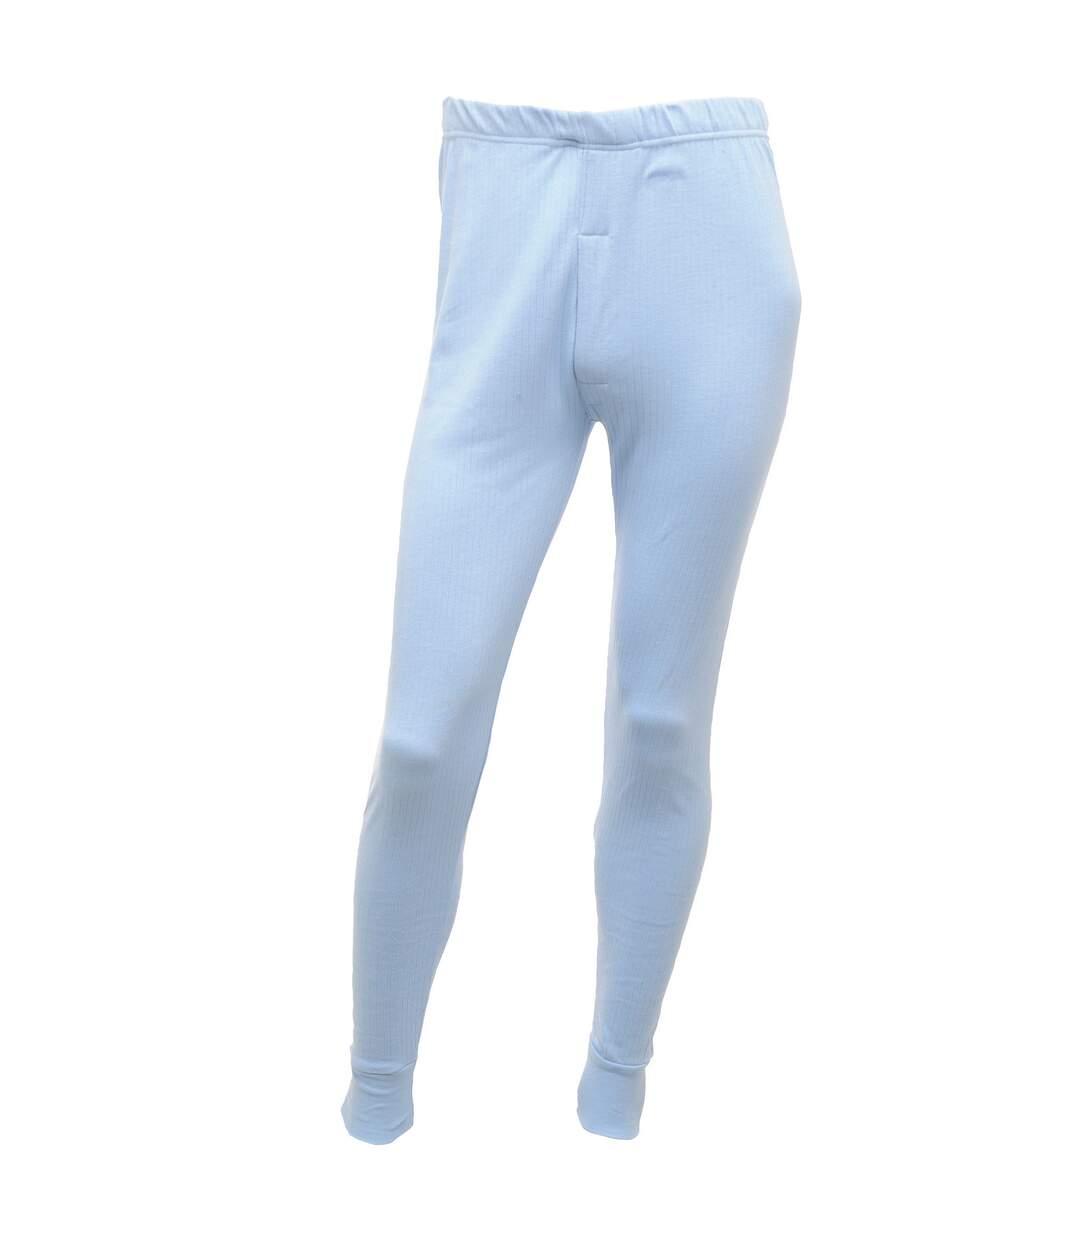 Regatta Mens Thermal Underwear Long Johns (Blue) - UTRW1260